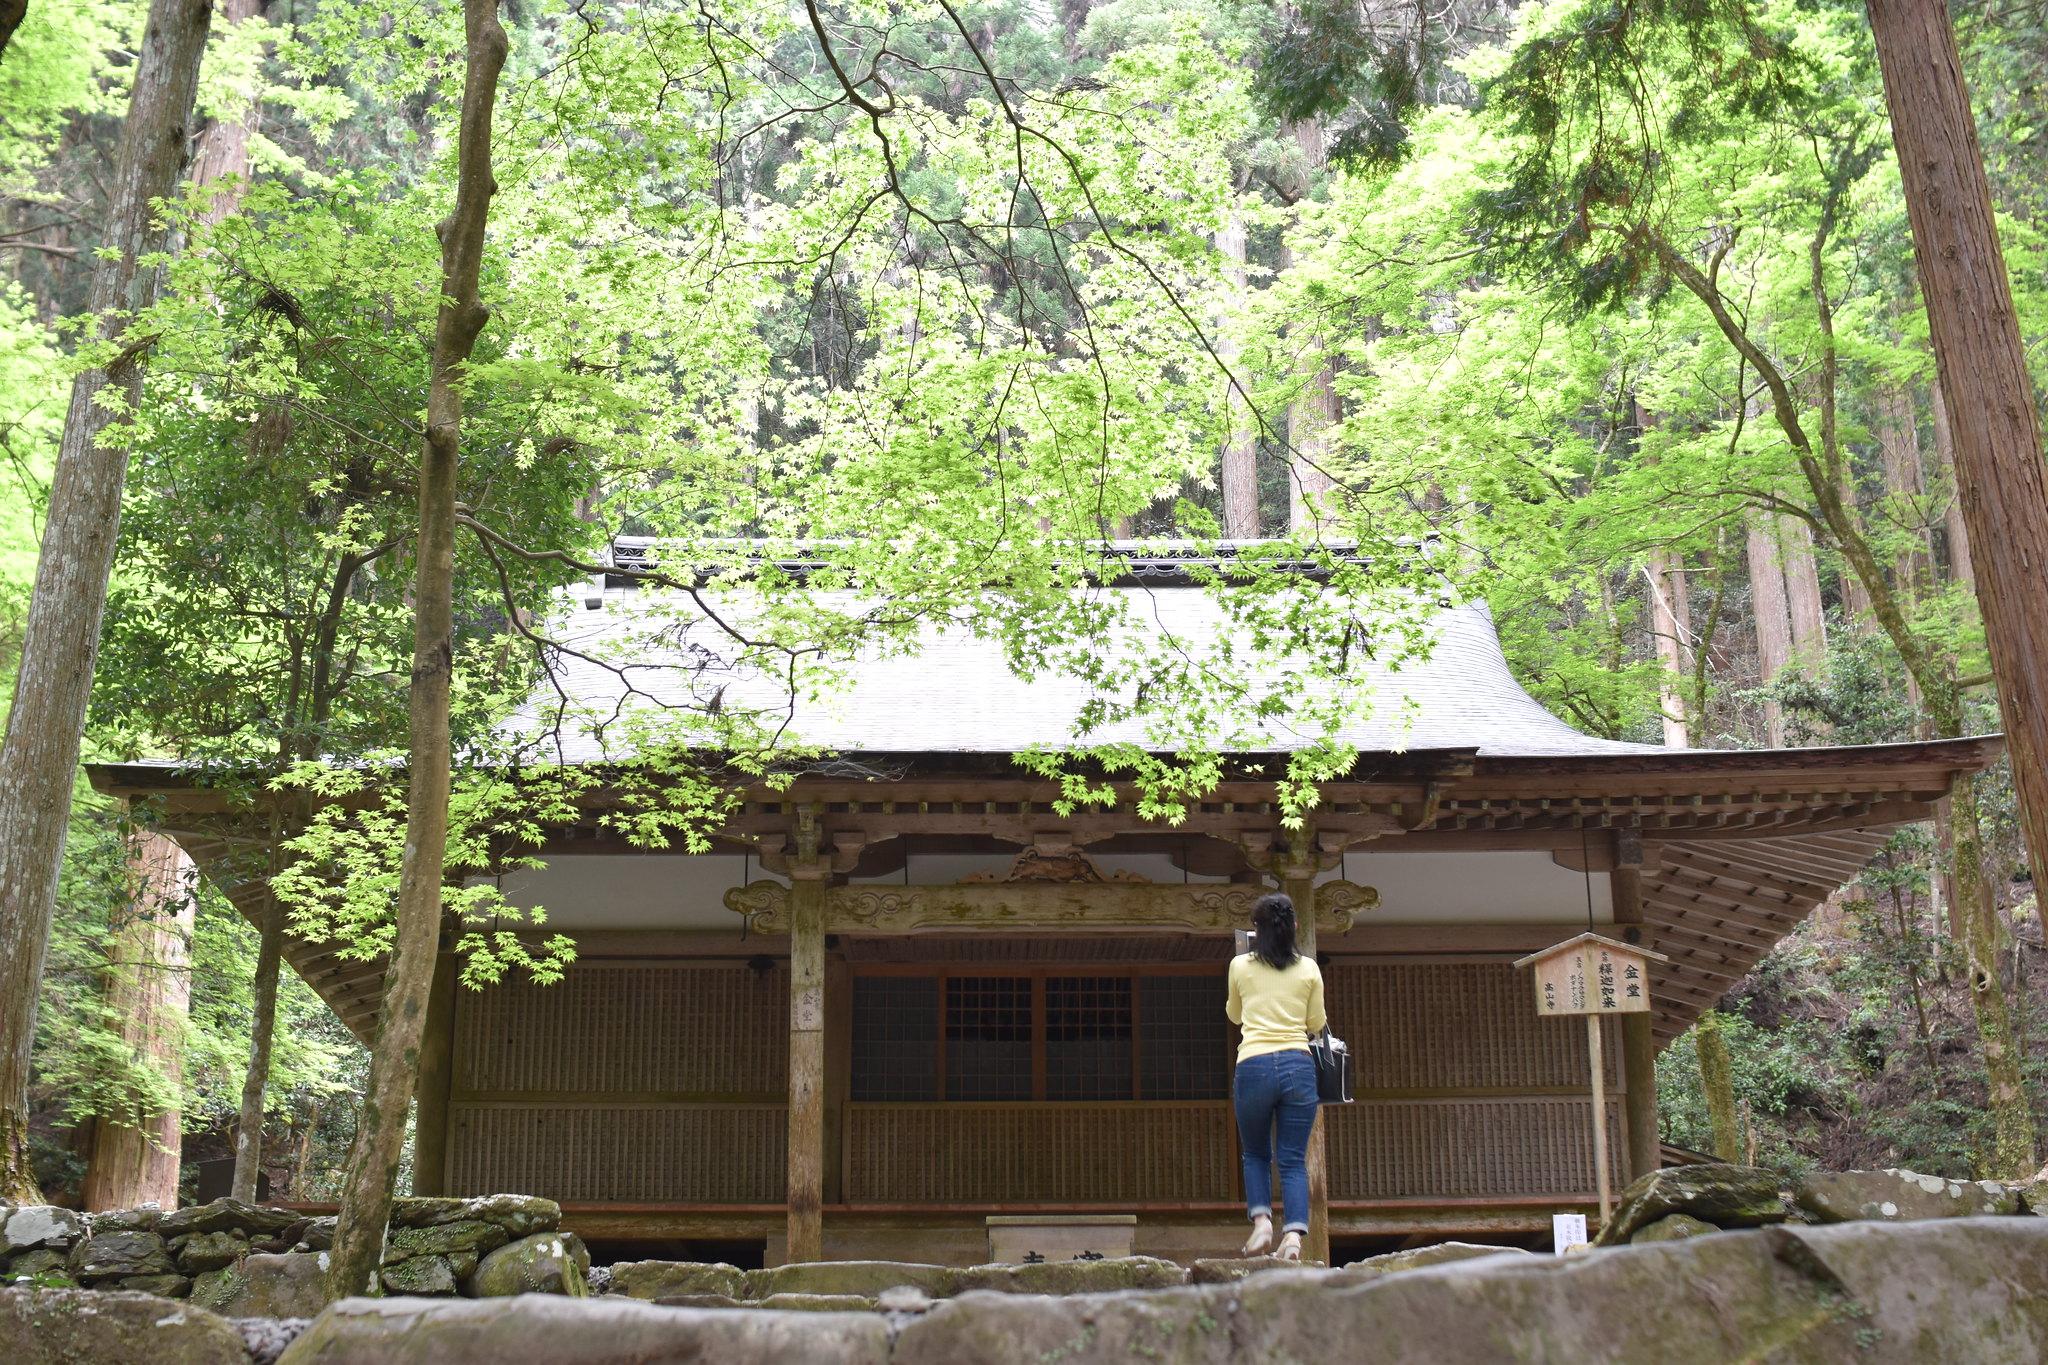 高山寺(Kozanji-temple)